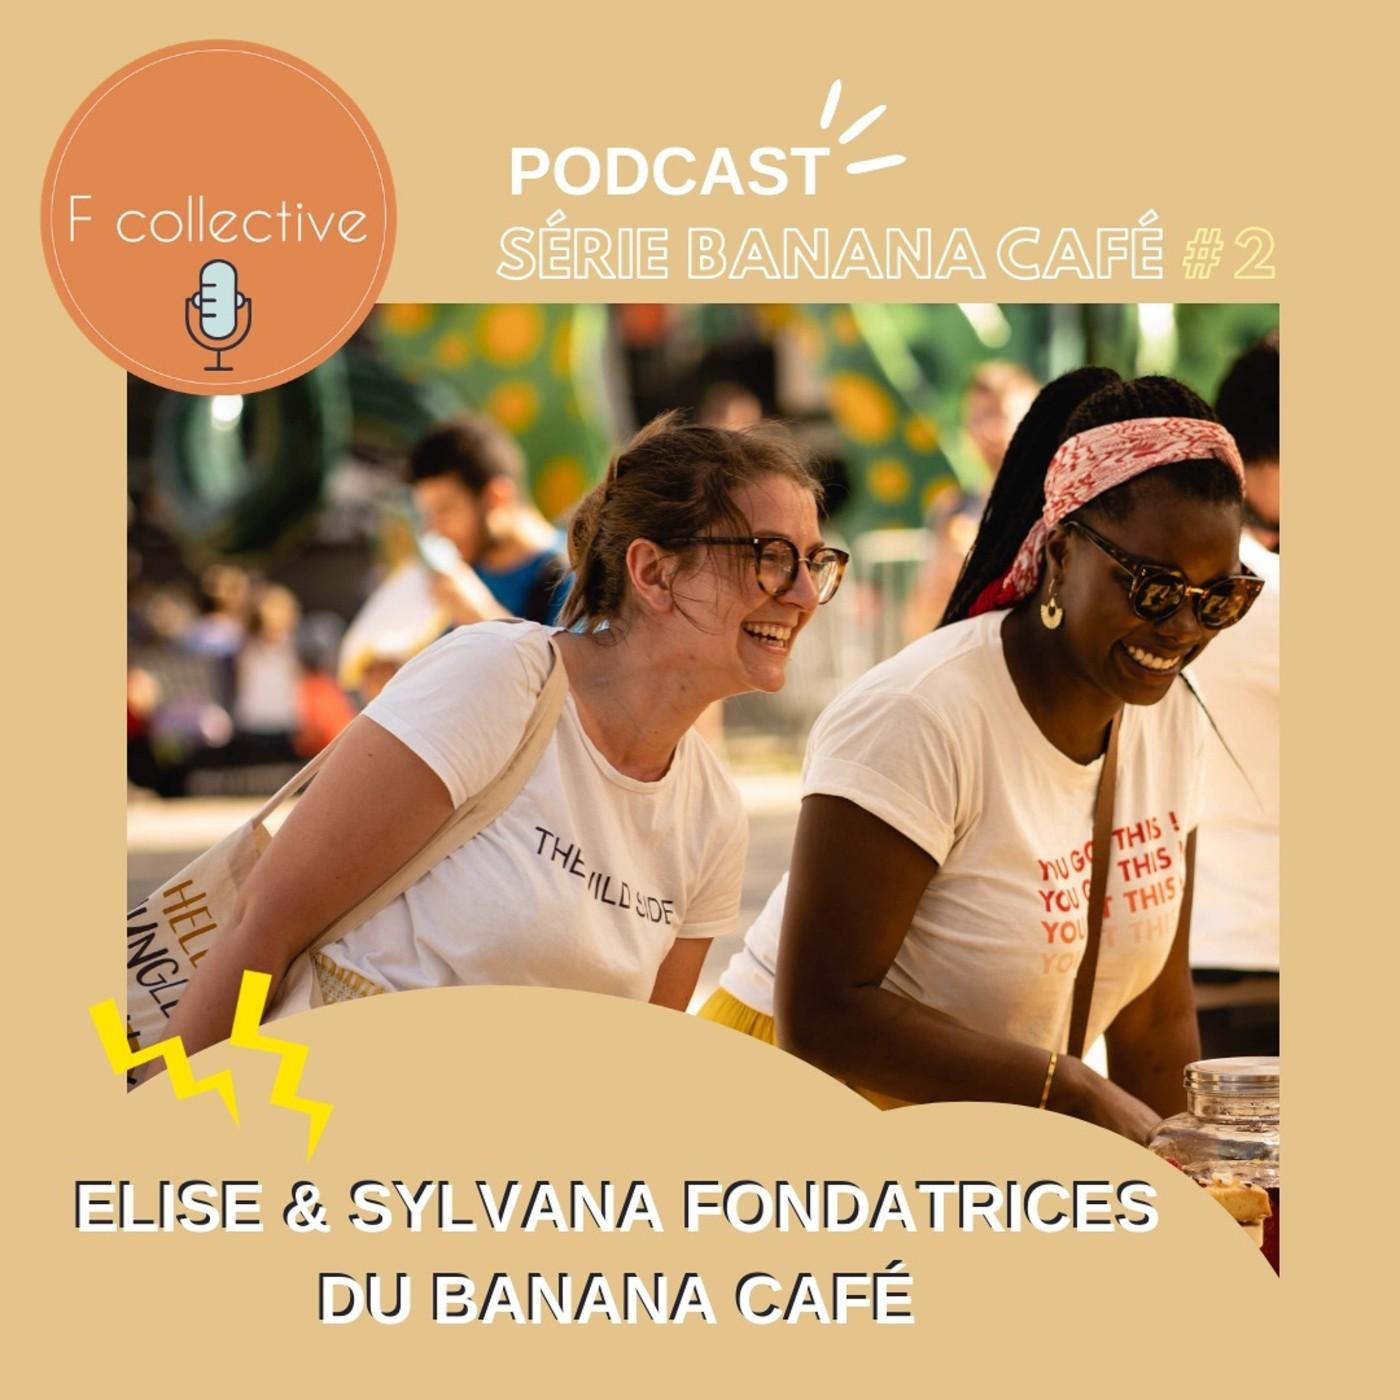 #11 SÉRIE BANANA CAFÉ - Ep 2 - Elise et Sylvana fondatrices du Banana Café (Lille)